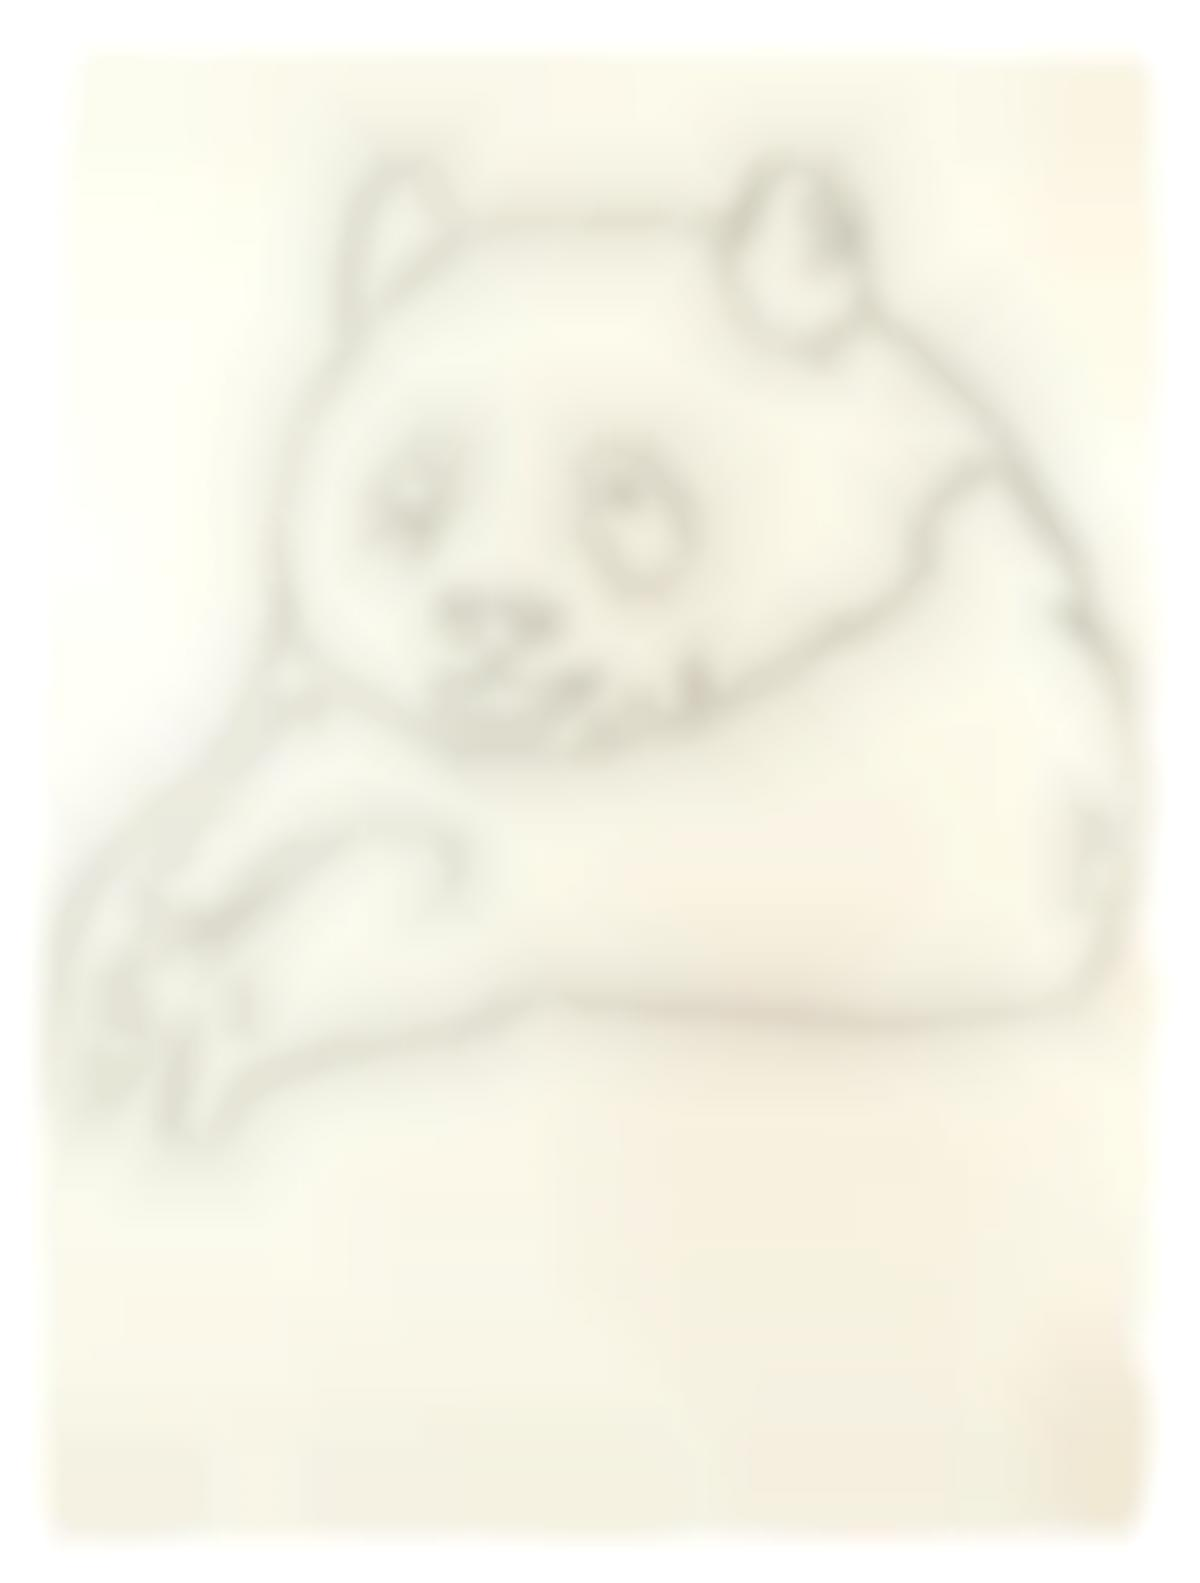 Andy Warhol-Endangered Species: Giant Panda-1983